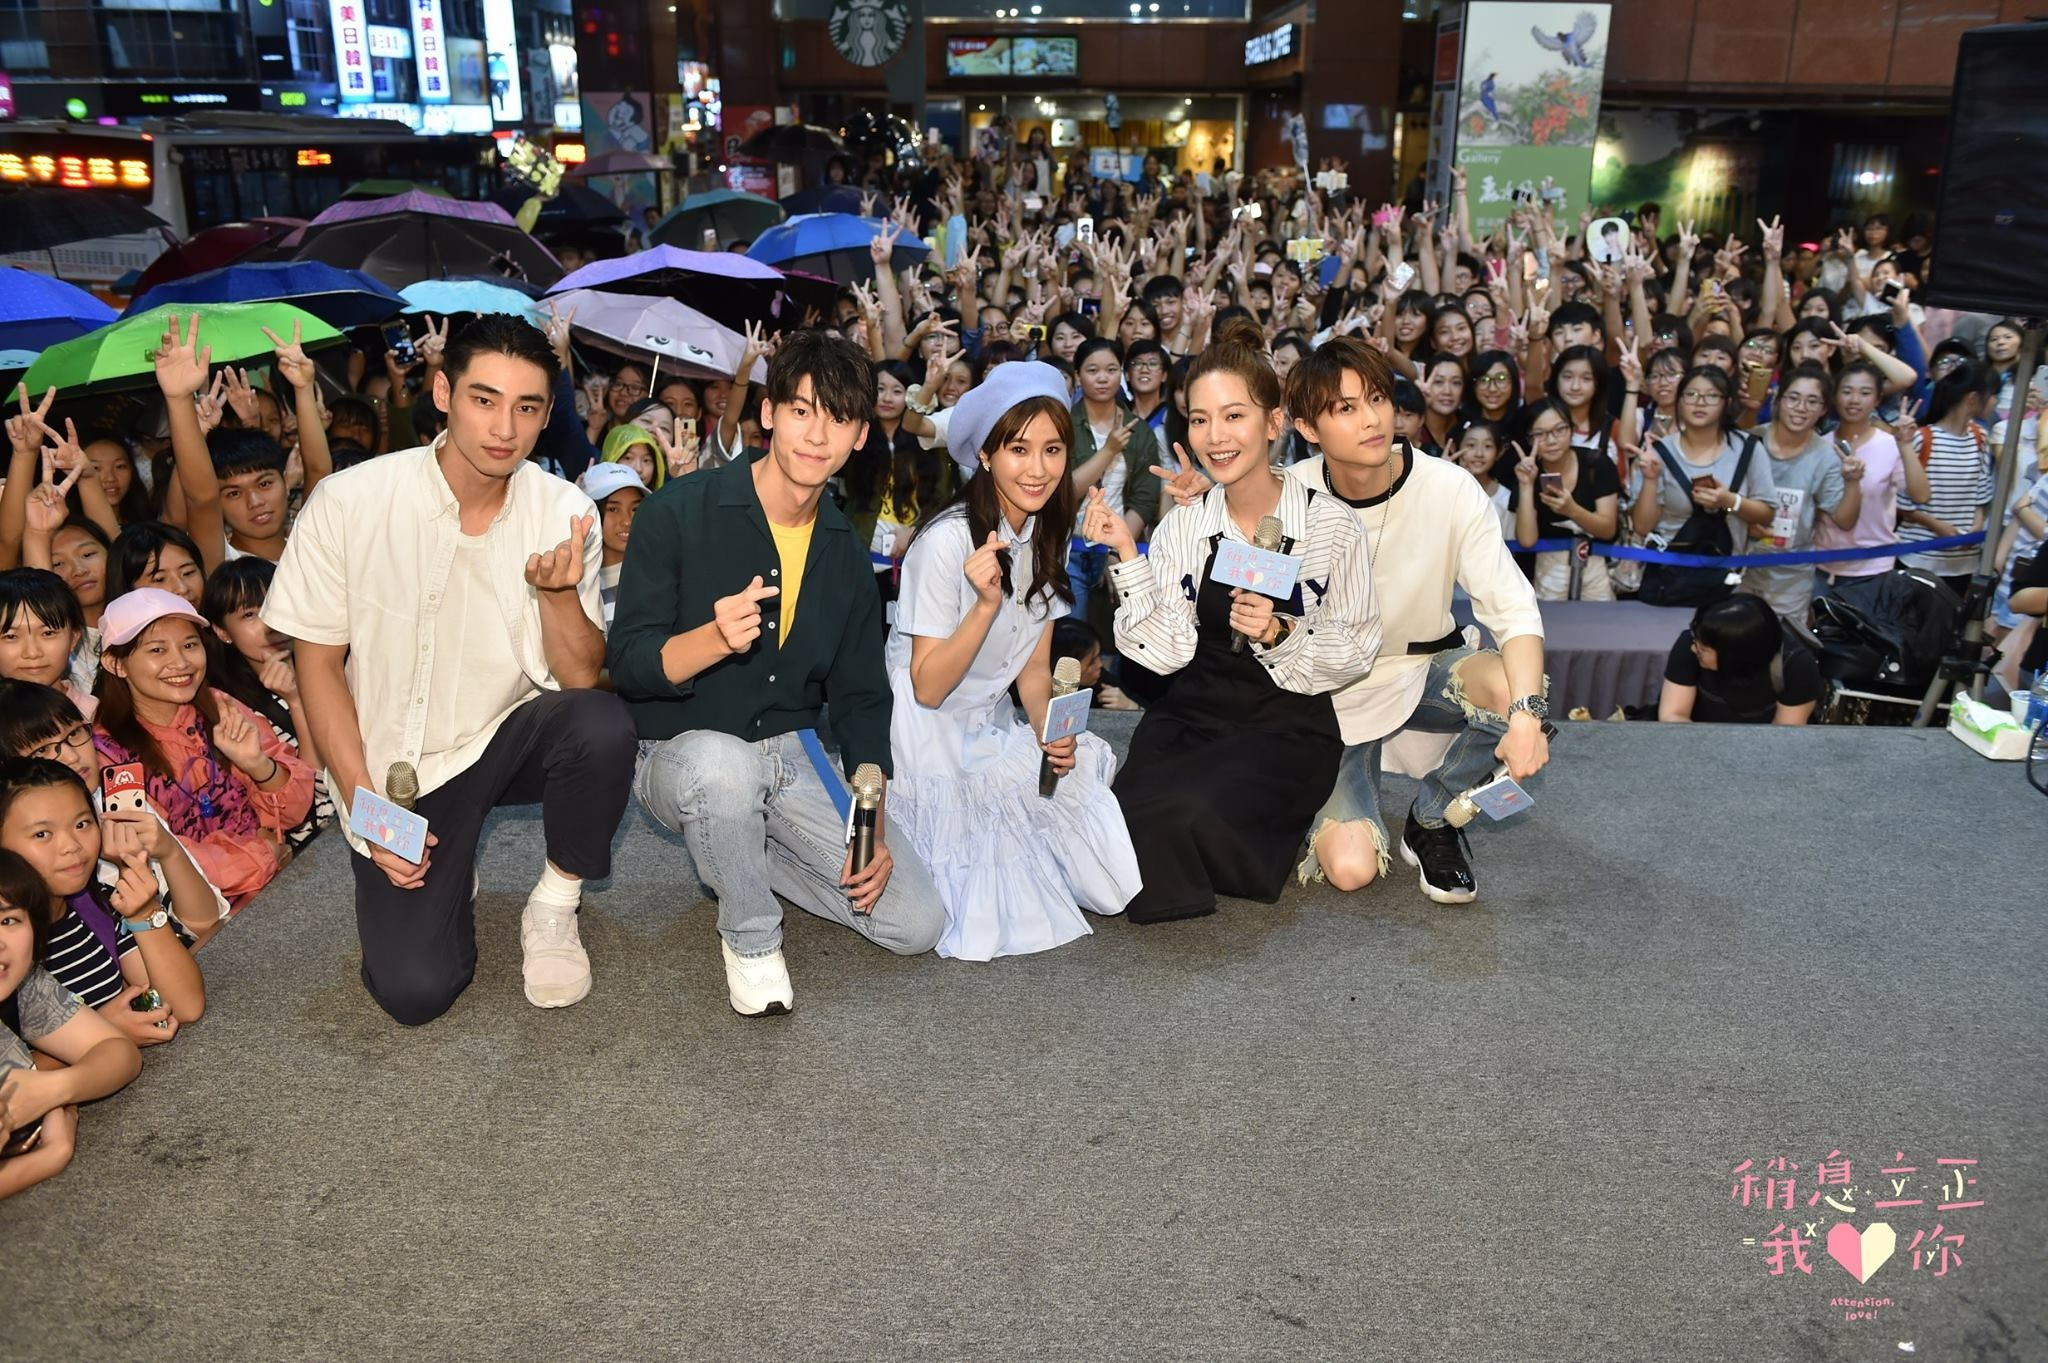 Joanne Tseng, Prince Chiu, Tiara Huang, Greg Han Hsu, and Kuang-Chen Chang at an event for Attention, Love! (2017)